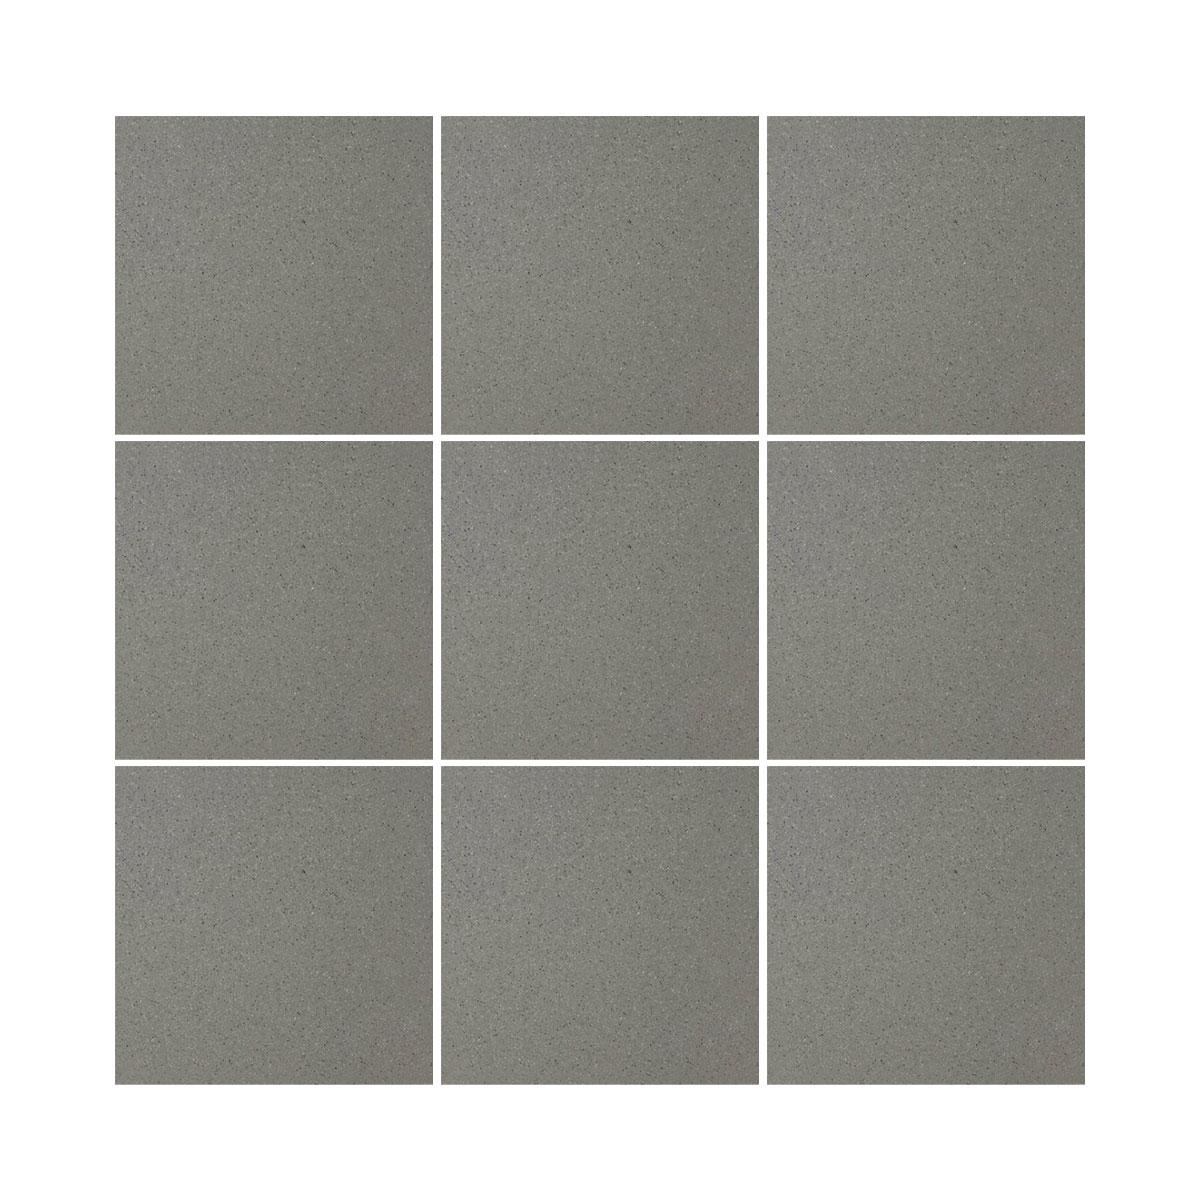 Patio - Dark Grey - Commercial Range Tiles